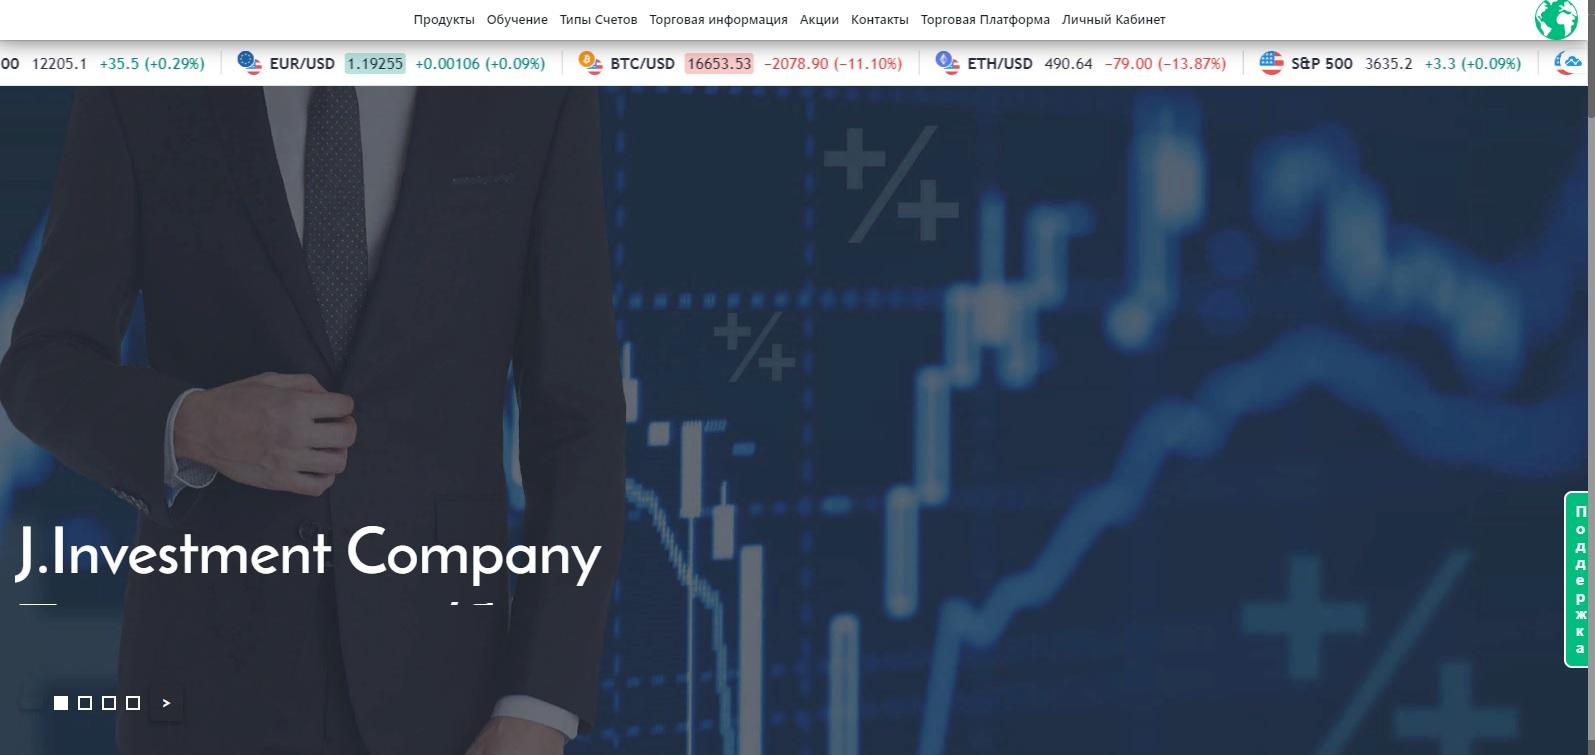 Главная страница сайта j.investment company